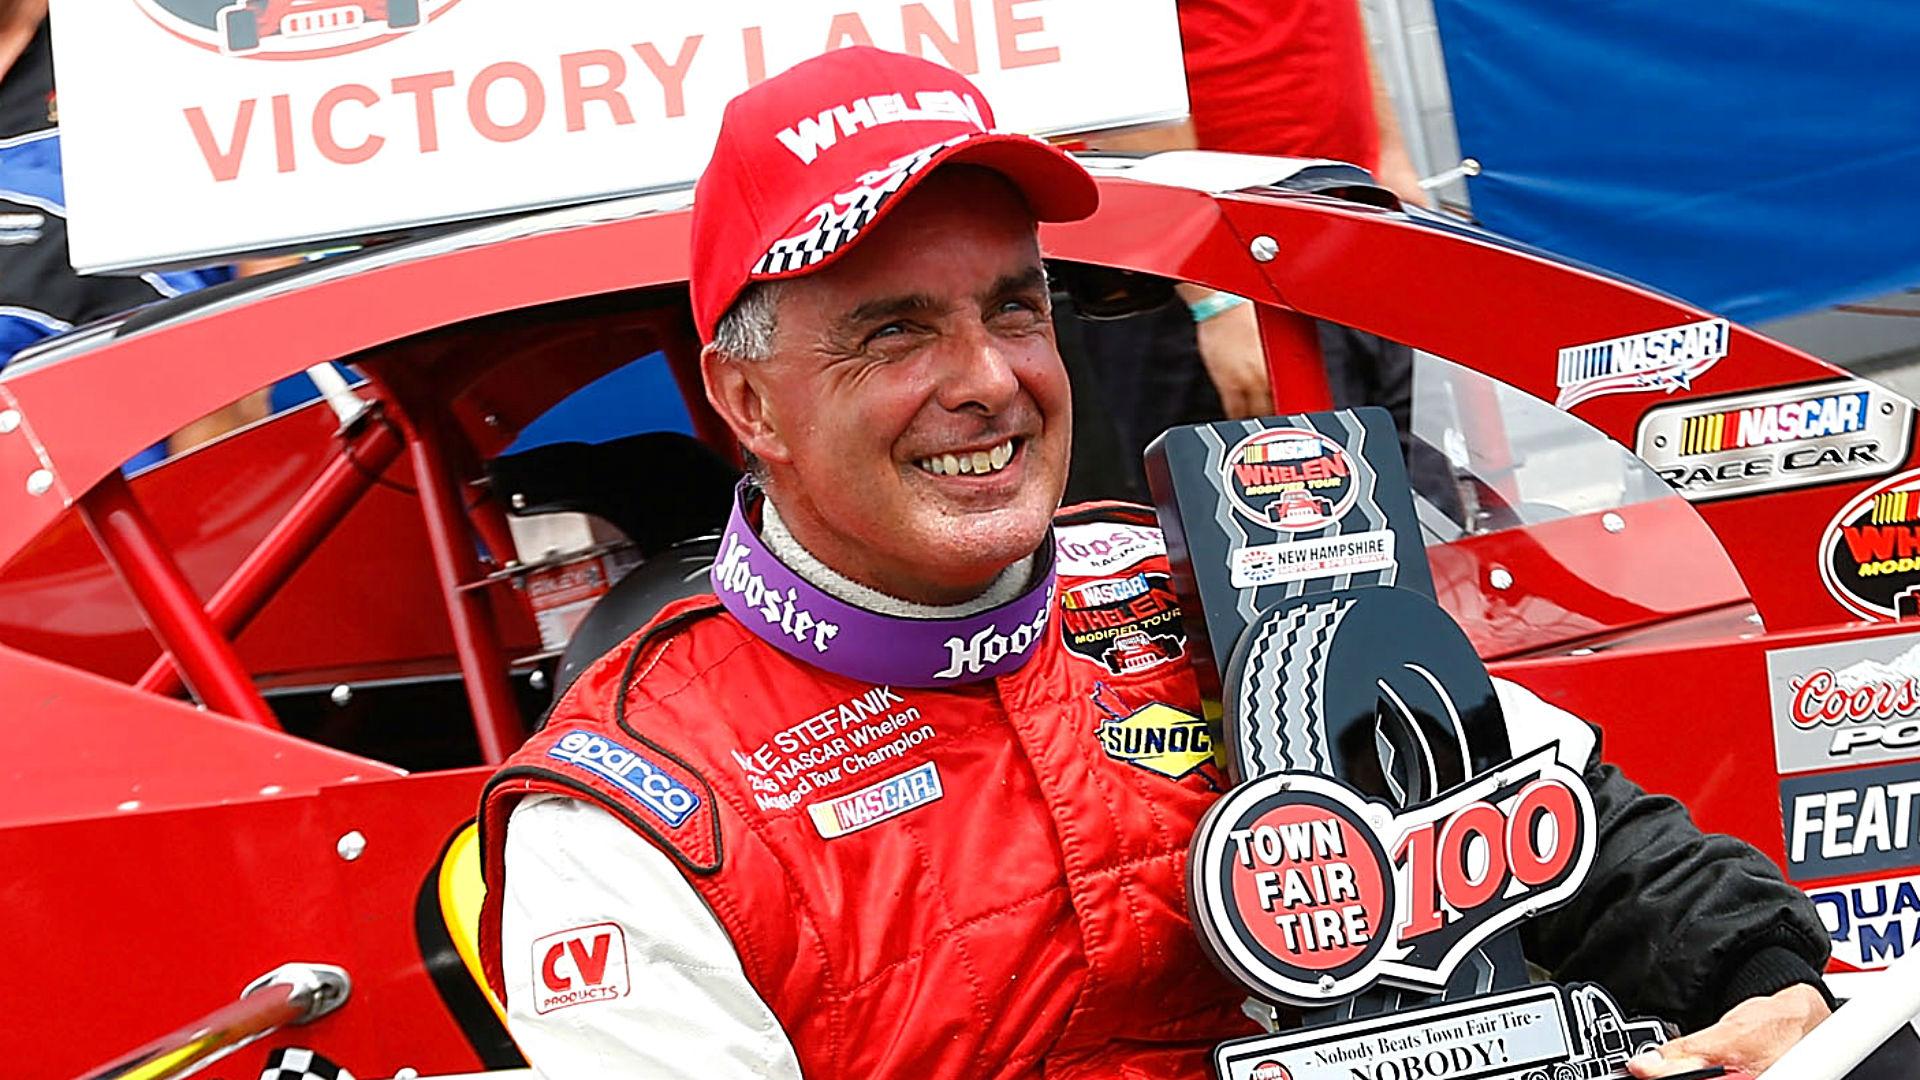 Longtime NASCAR driver Mike Stefanik, 61, dies in plane crash – Sporting News